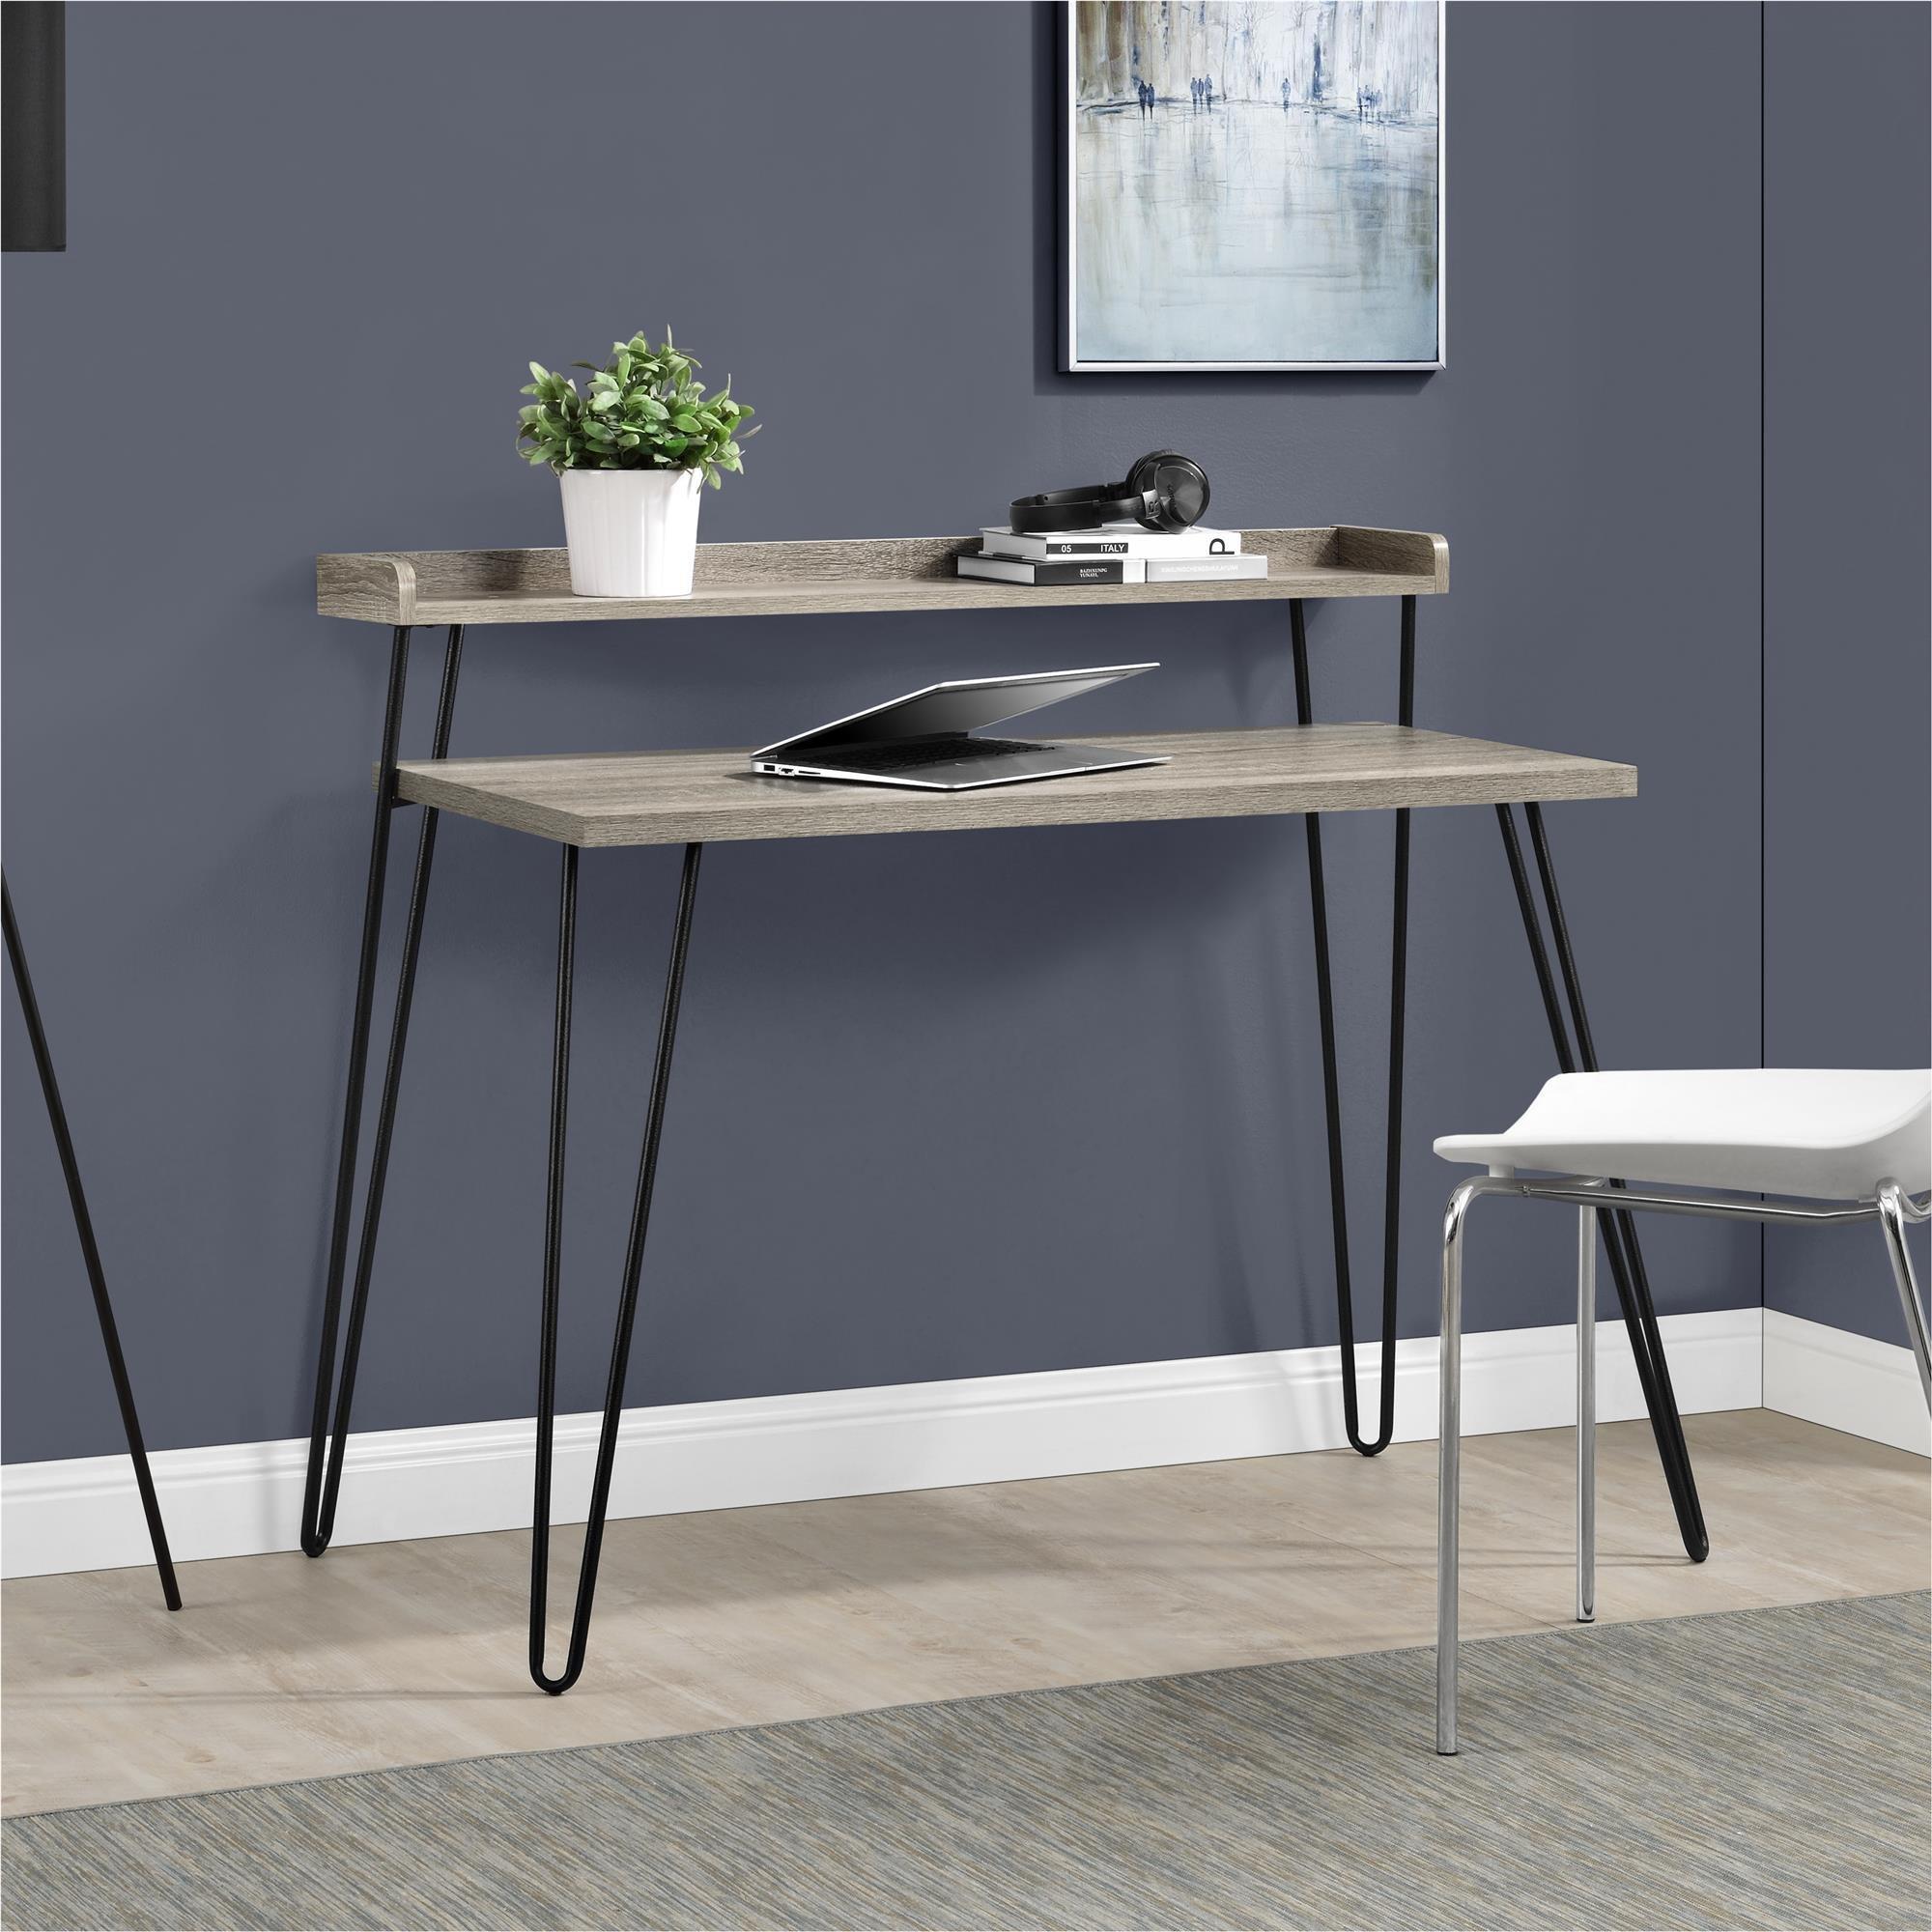 Ameriwood Home Haven Retro Desk Riser, Weathered Oak by Ameriwood Home (Image #6)